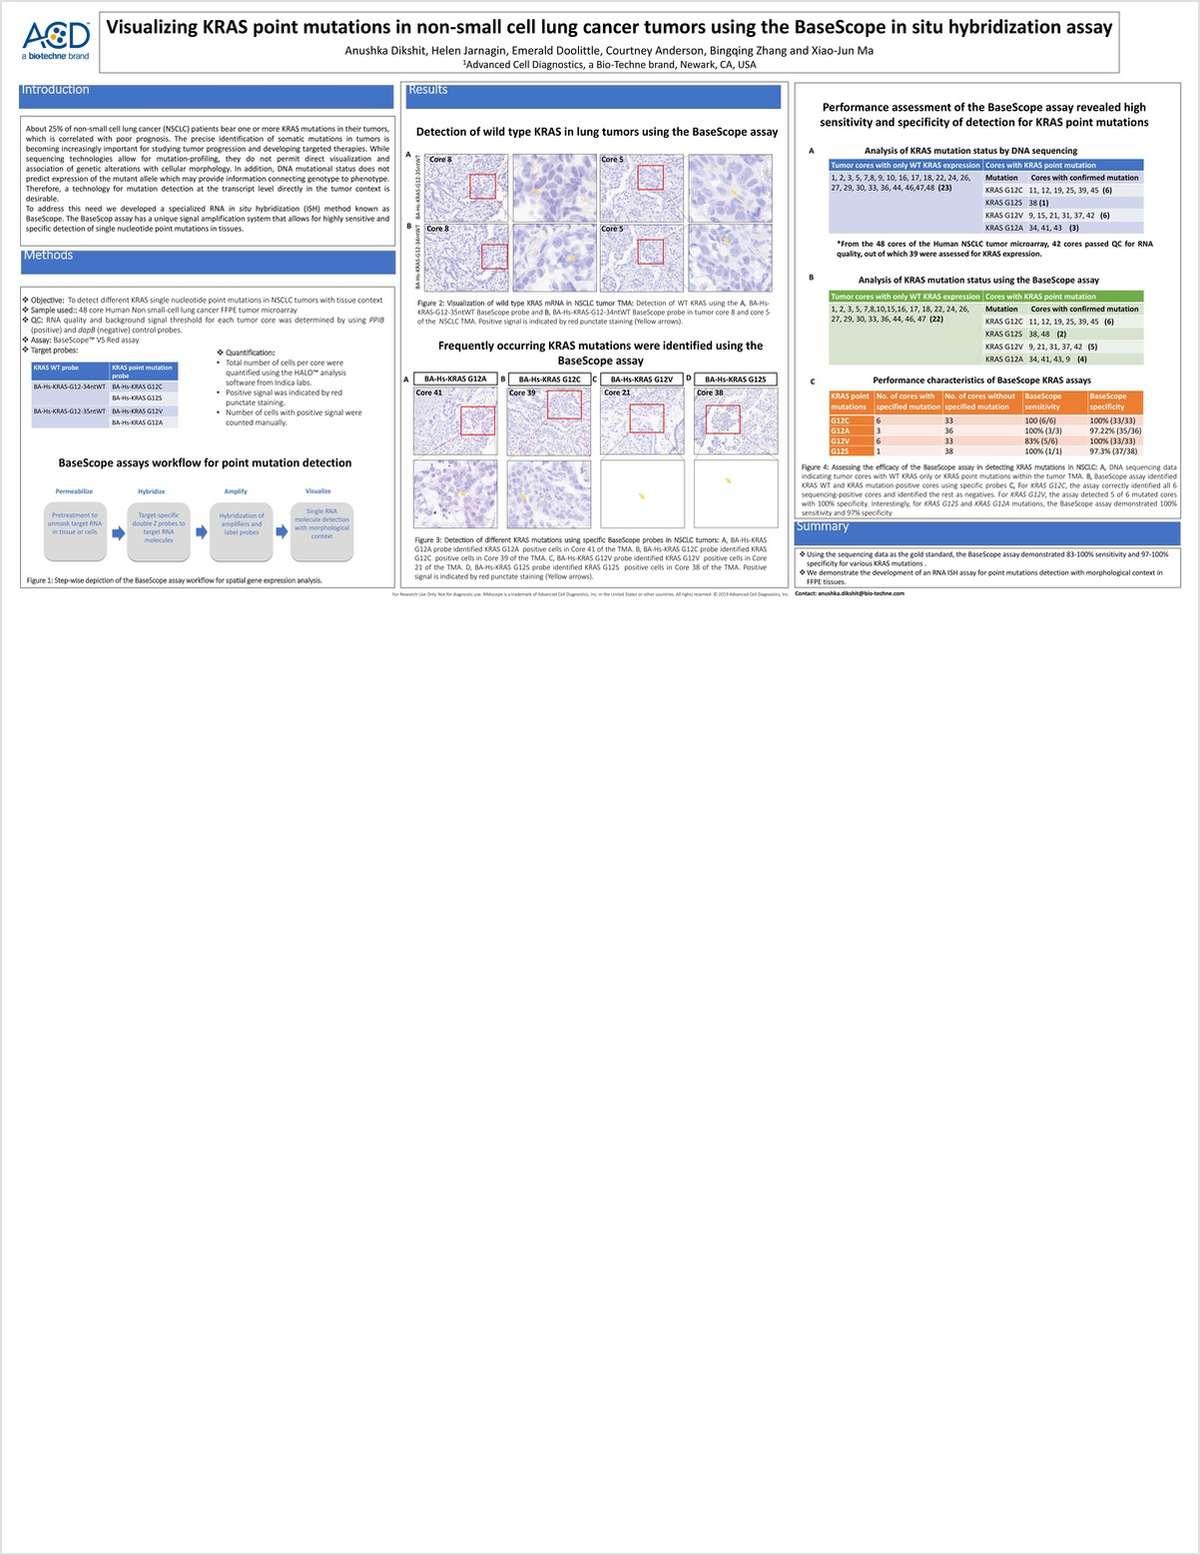 Visualize KRAS Point Mutations Using BaseScope ISH